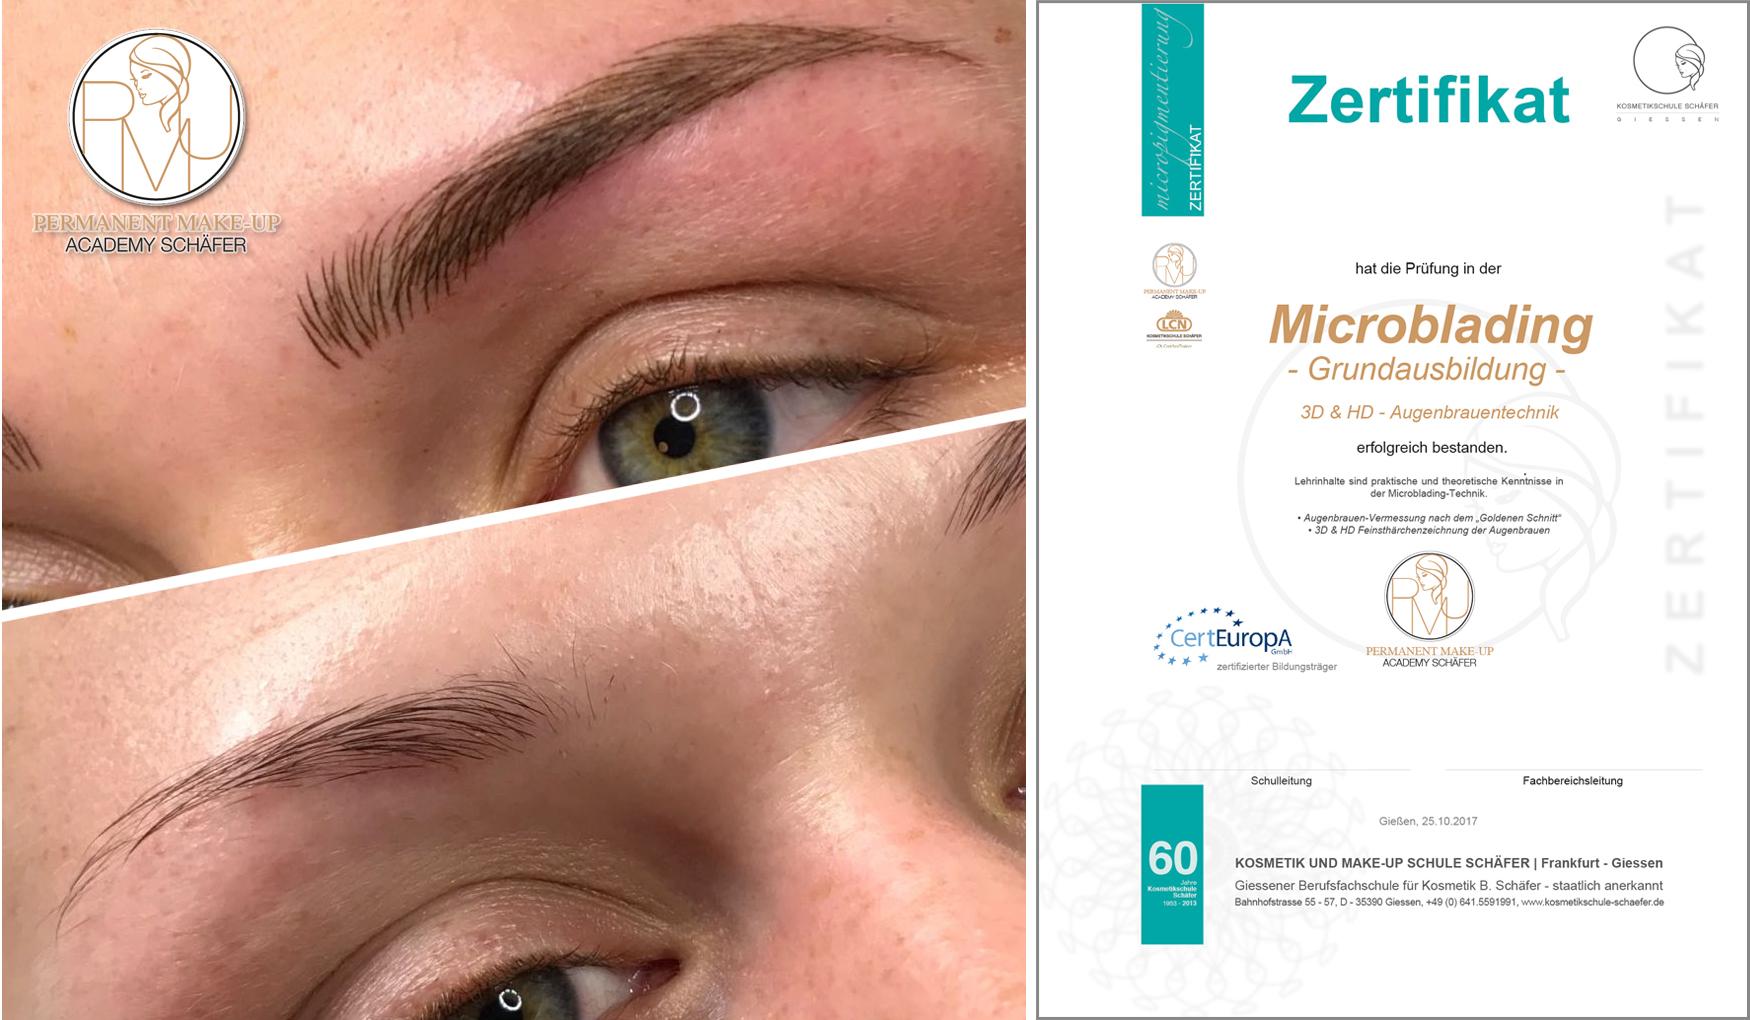 Microblading - Kosmetikschule Schäfer - Zertifikat PMU Schäfer 17